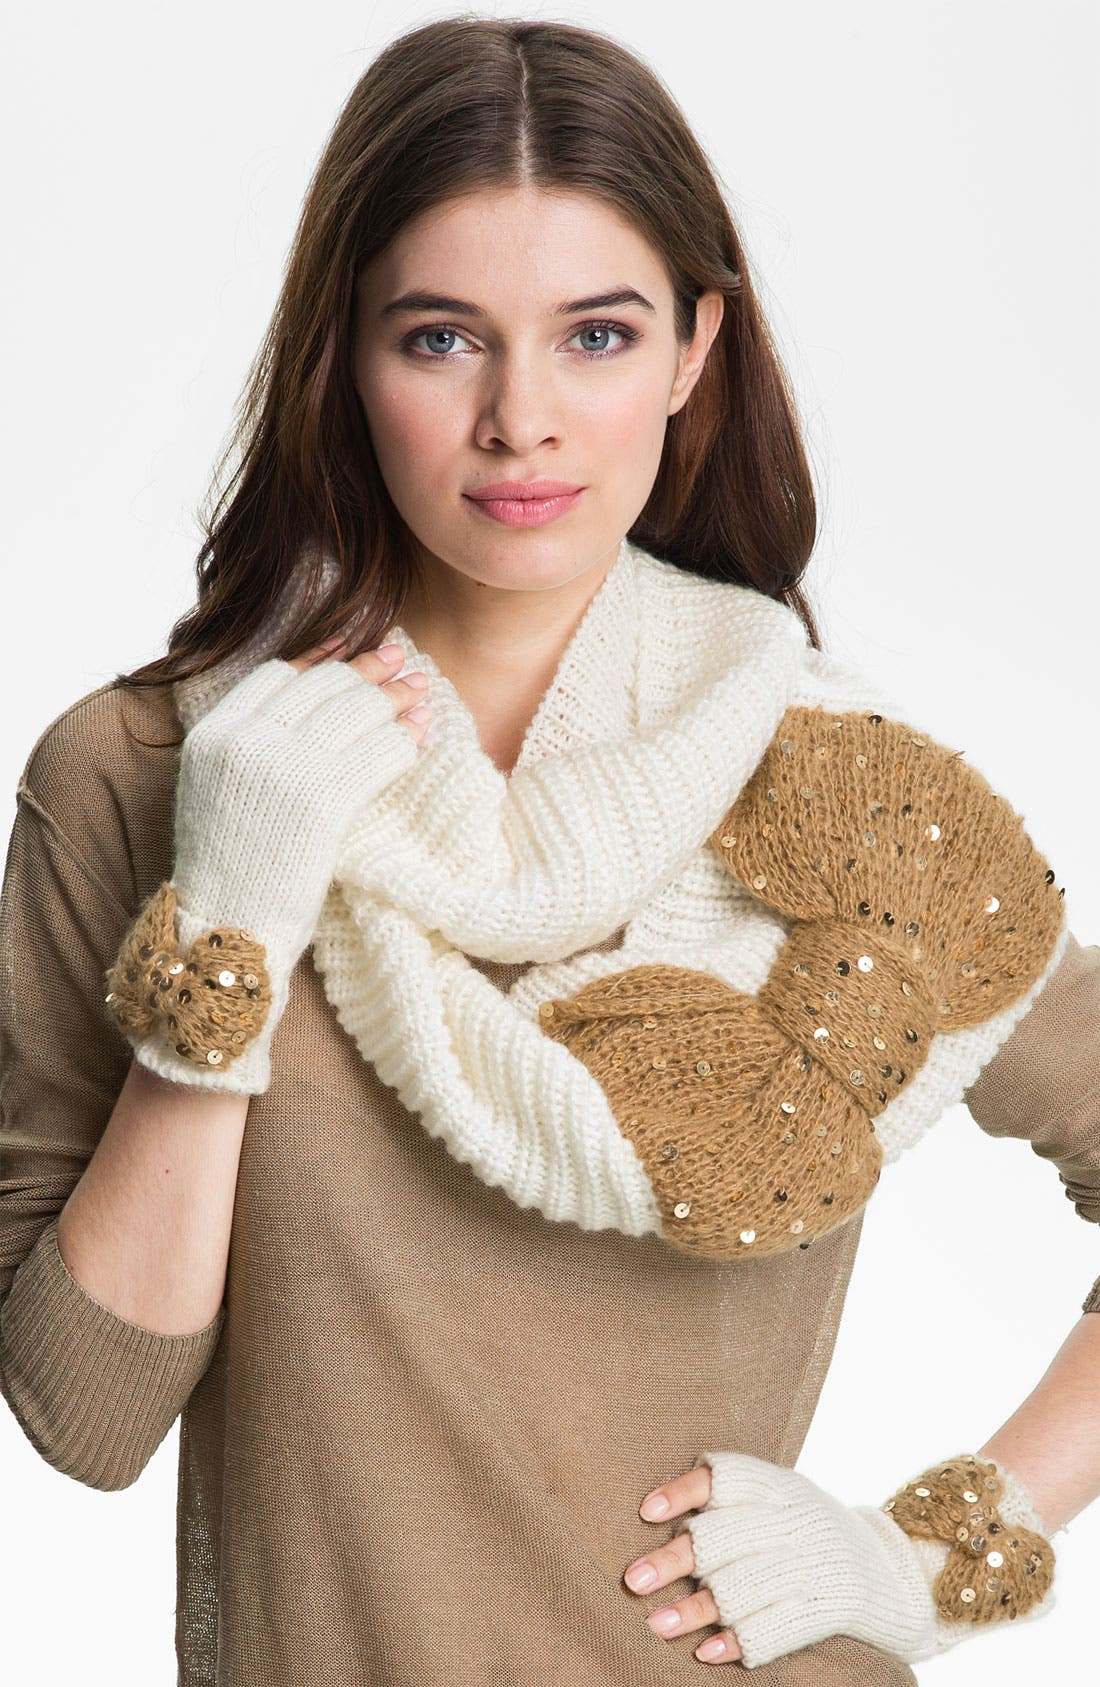 Alternate Image 1 Selected - Betsey Johnson 'Bow Nanza' Fingerless Gloves